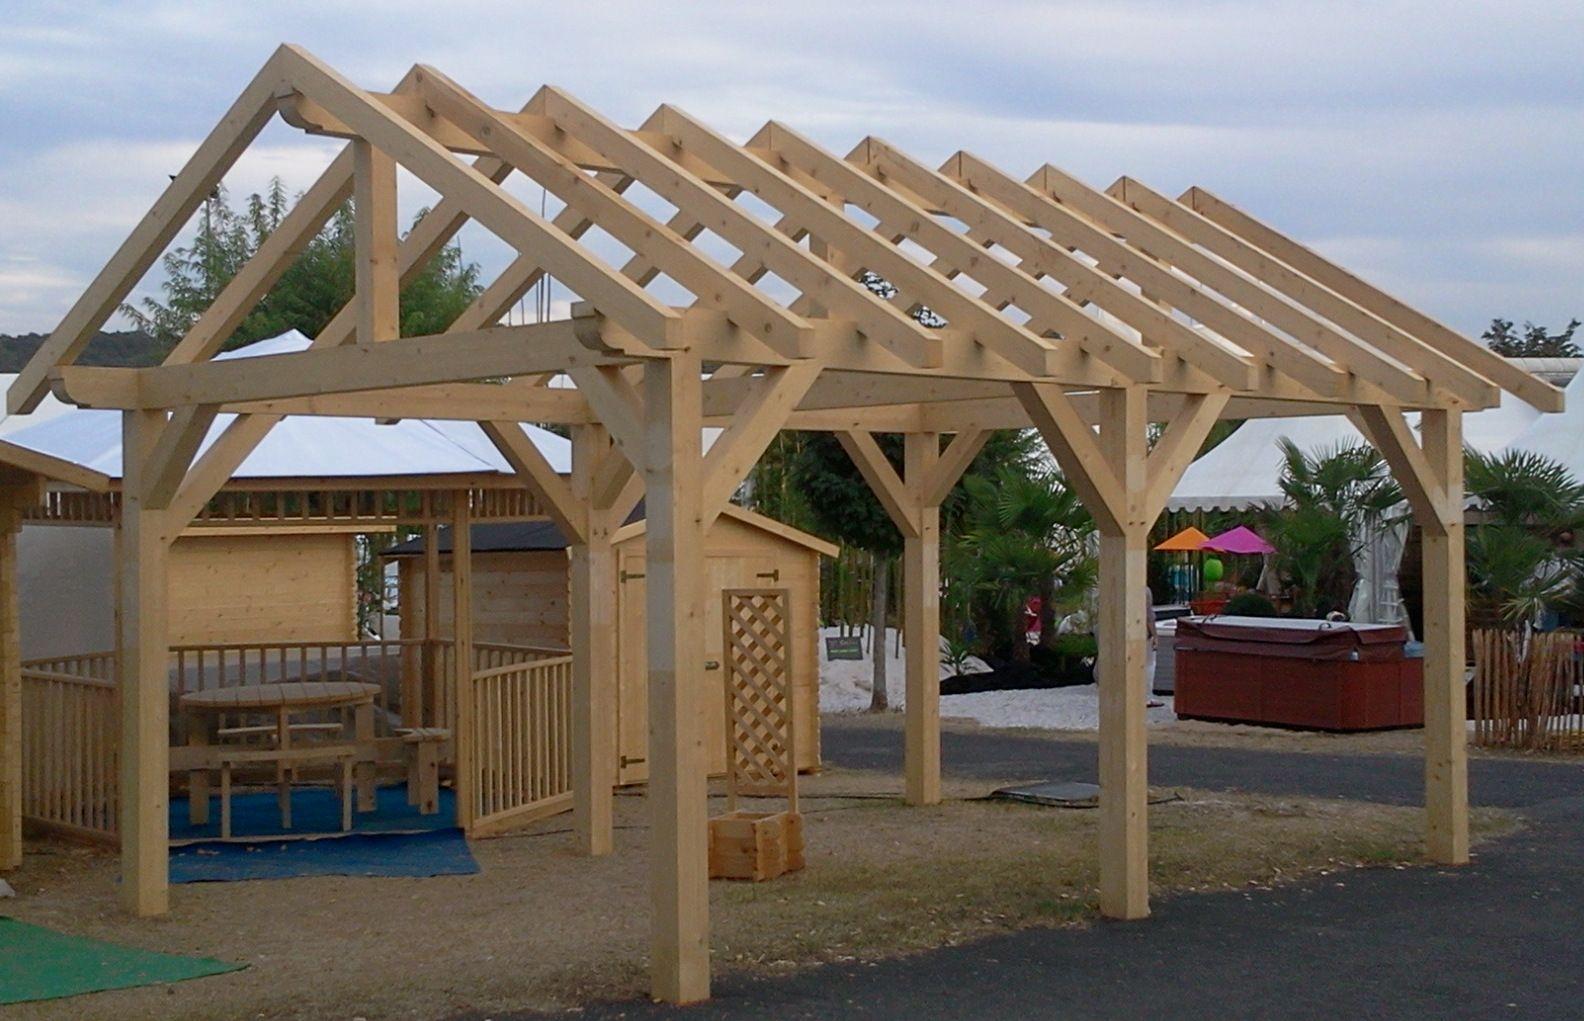 Electronic Building Kits For Kids | Trail Blazer Metal Buildings ...